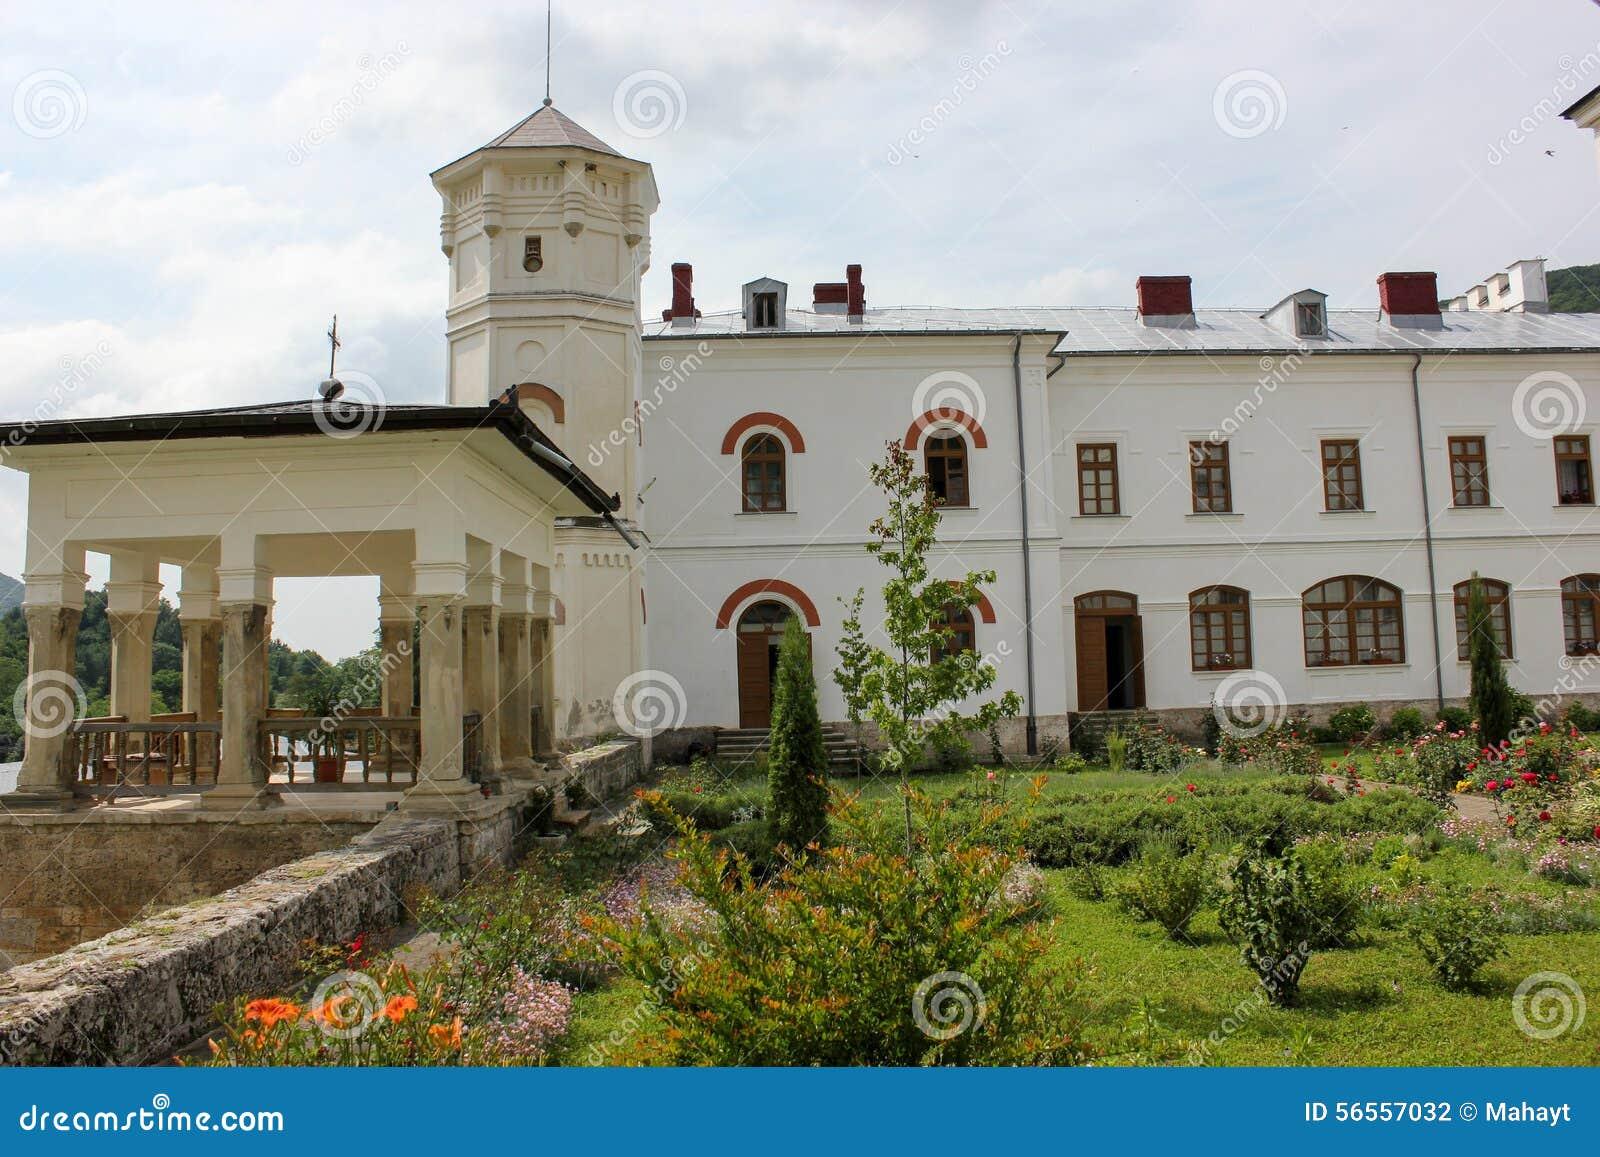 Download Αγροτικό τοπίο με το παλαιό μοναστήρι στη Ρουμανία Στοκ Εικόνες - εικόνα από ορόσημο, ιστορικός: 56557032